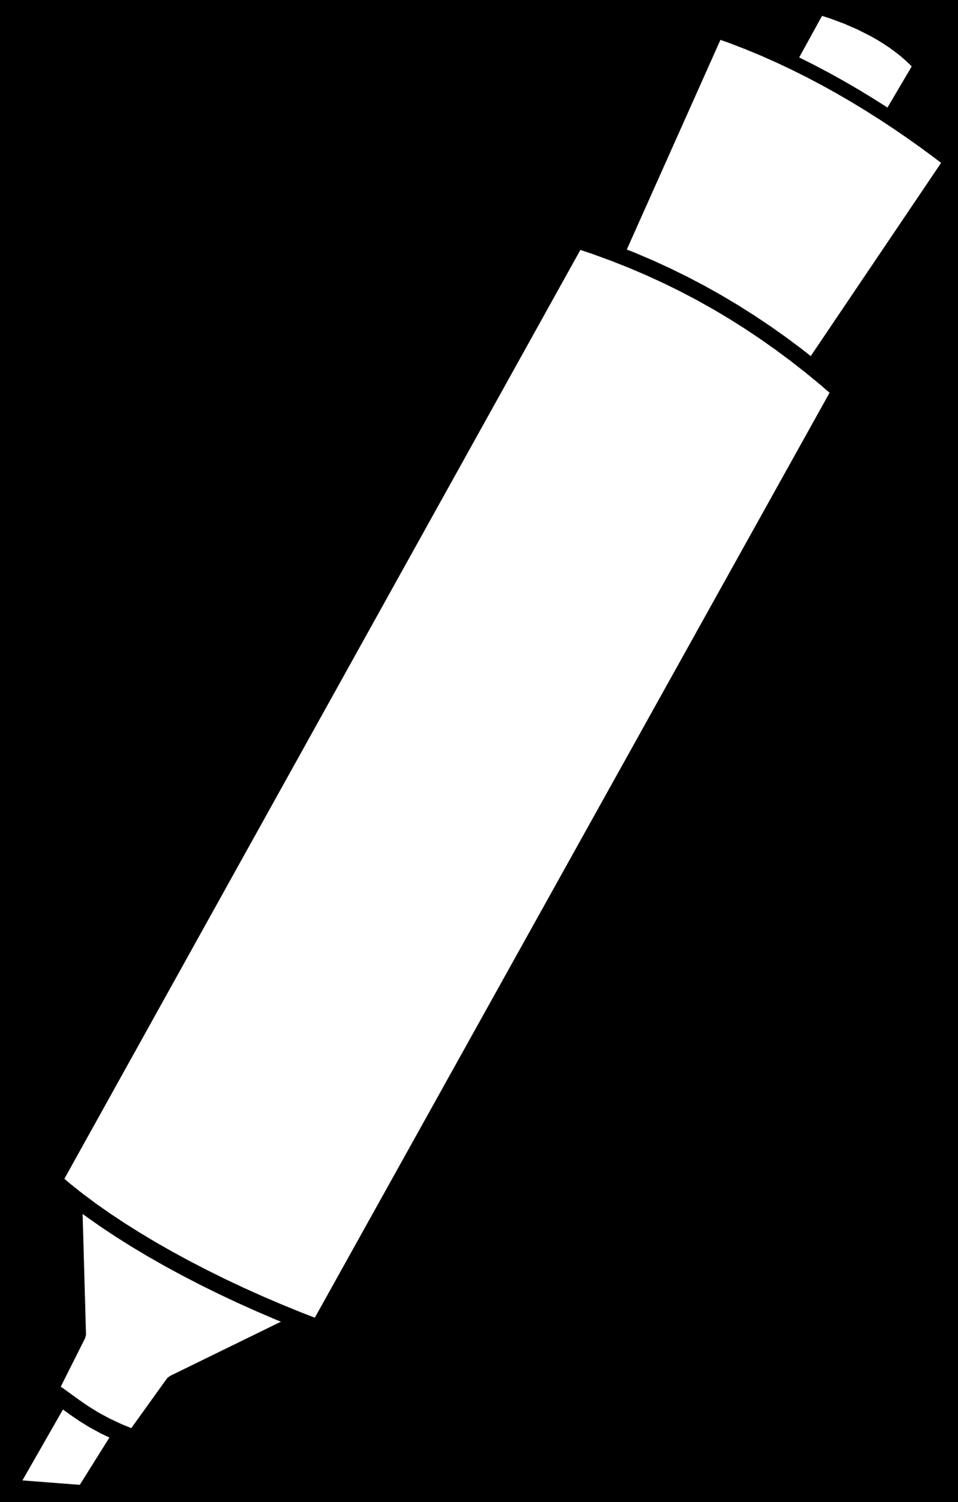 marqueur / marker